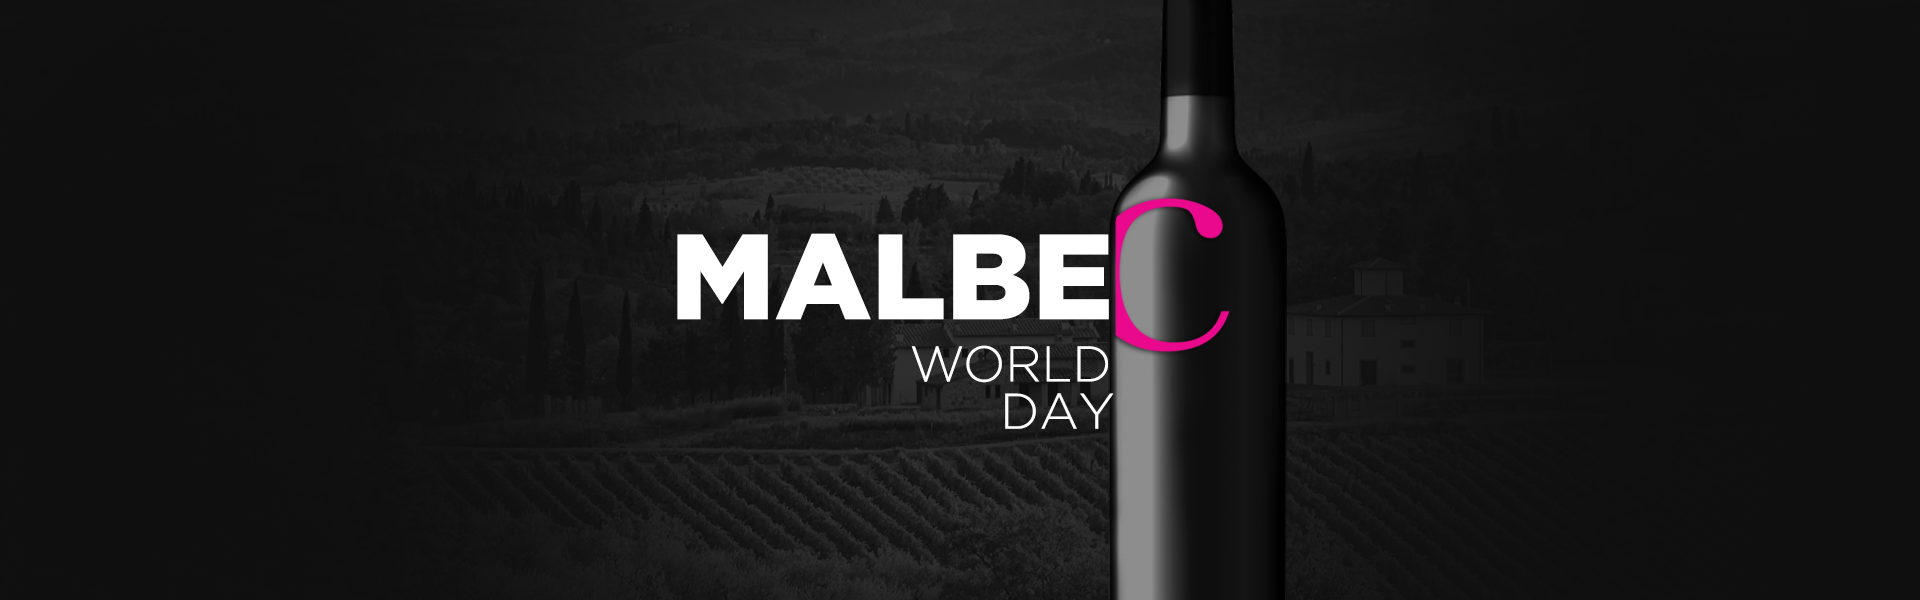 Tim-tim Comemore o Malbec World Day